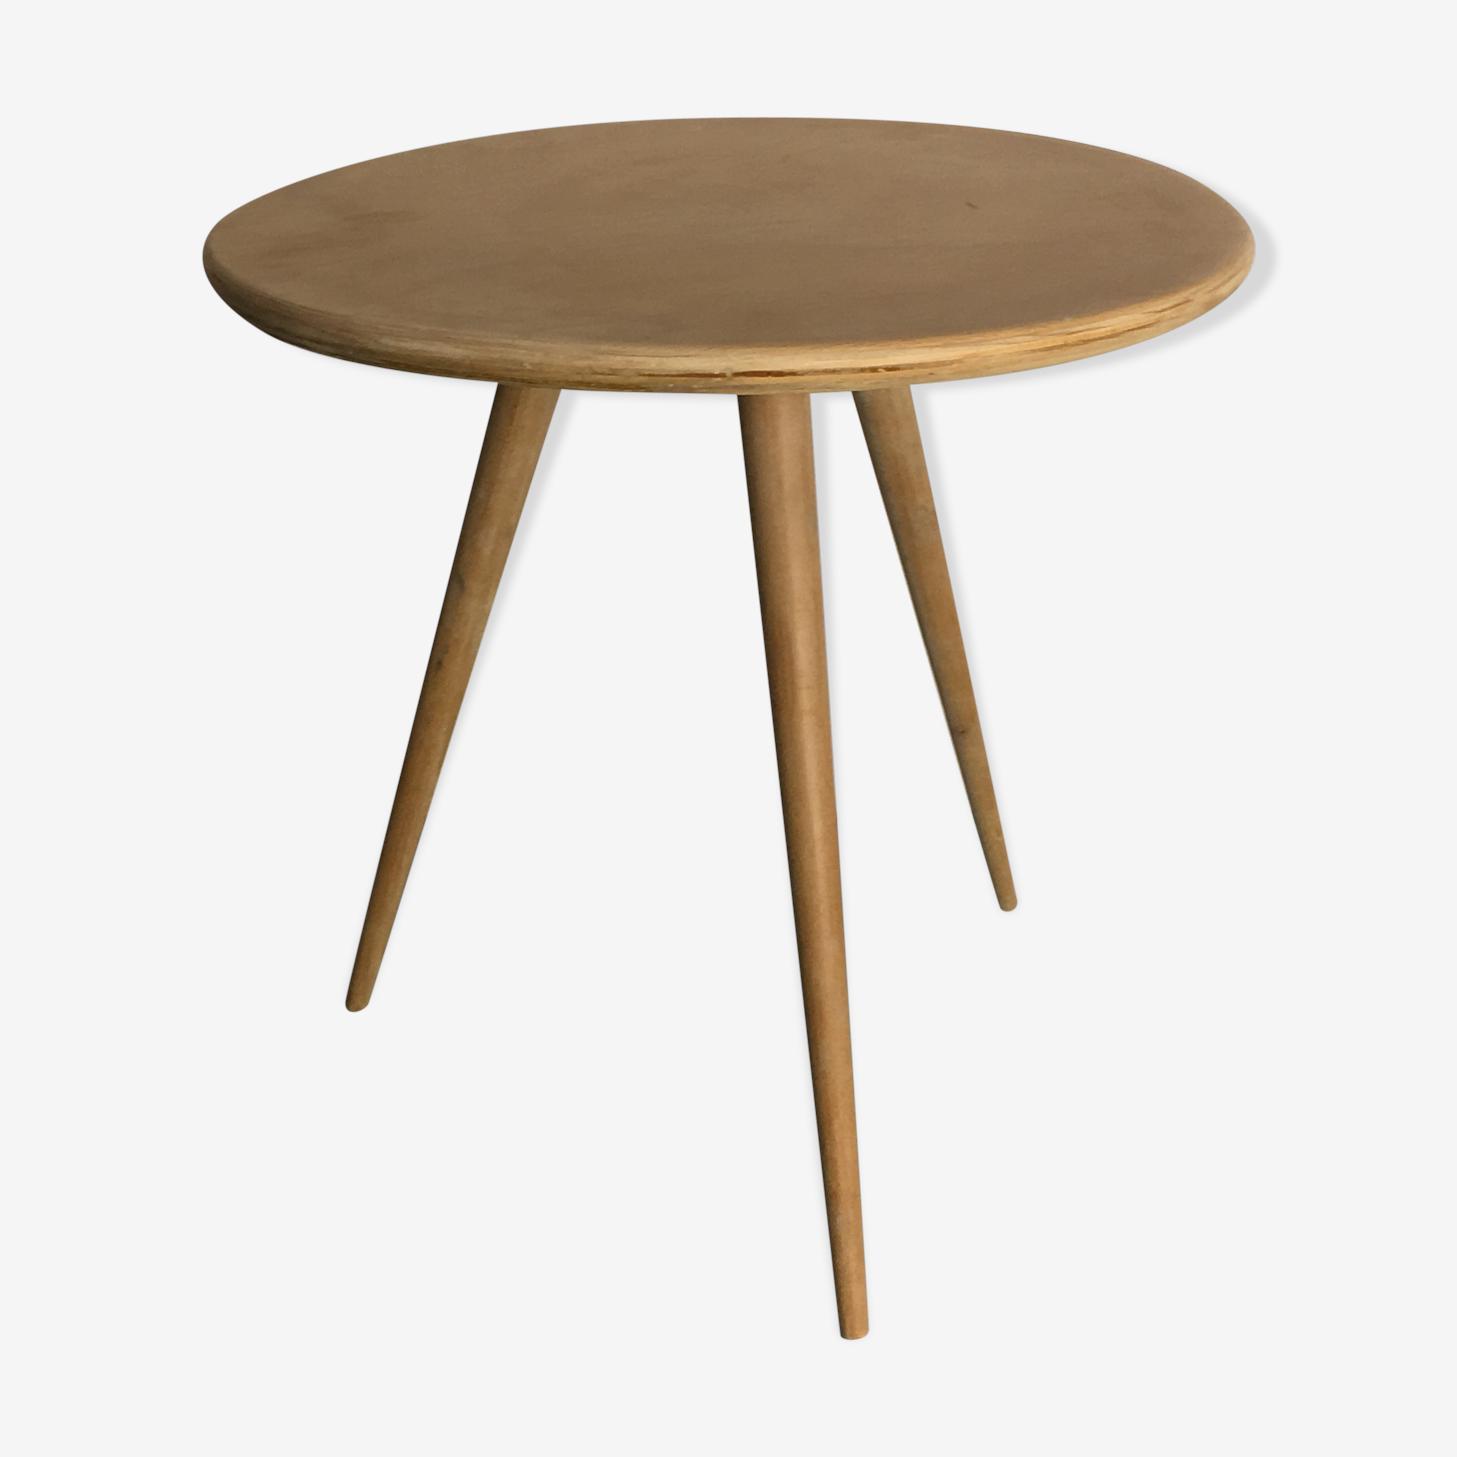 Table basse tripode vintage années 60 bois brut